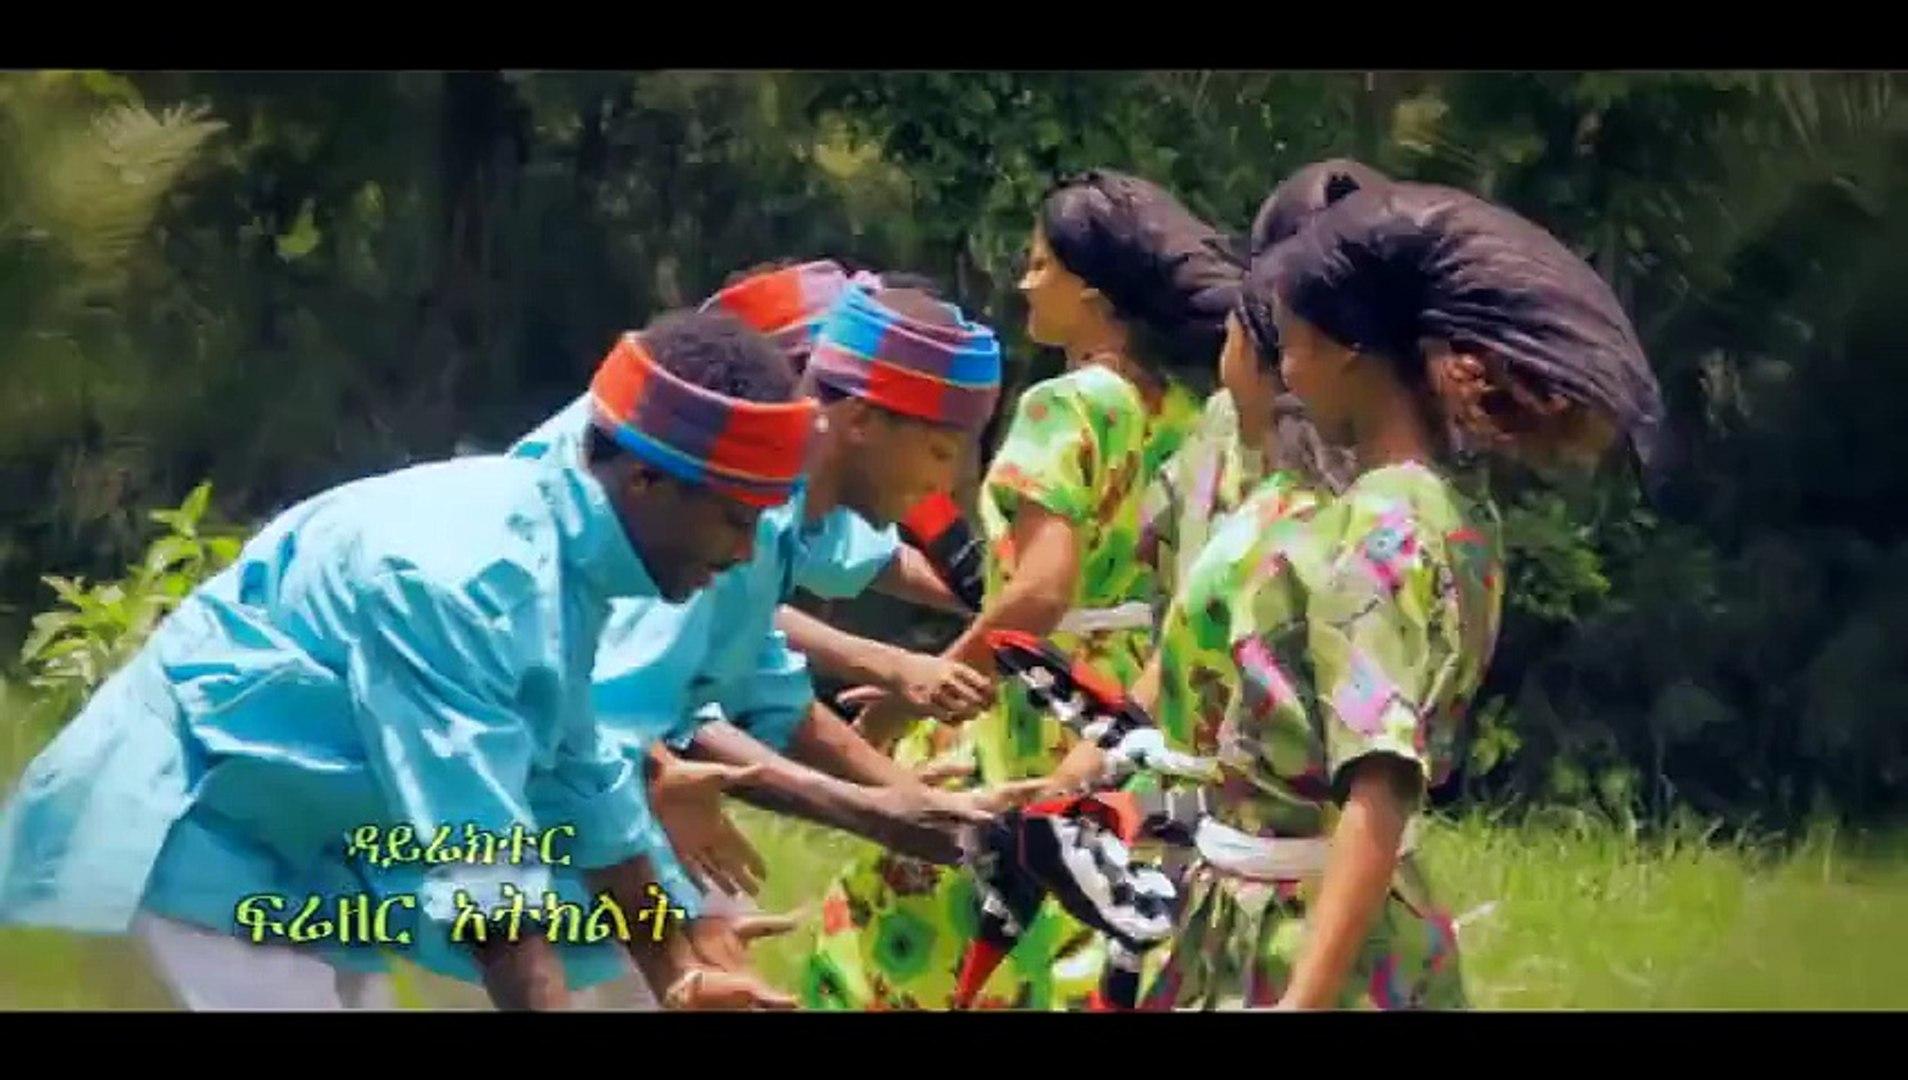 Ethiopia - Deme Lula - Ader Bane - (Official Music Video) - New Ethiopian Music 2015